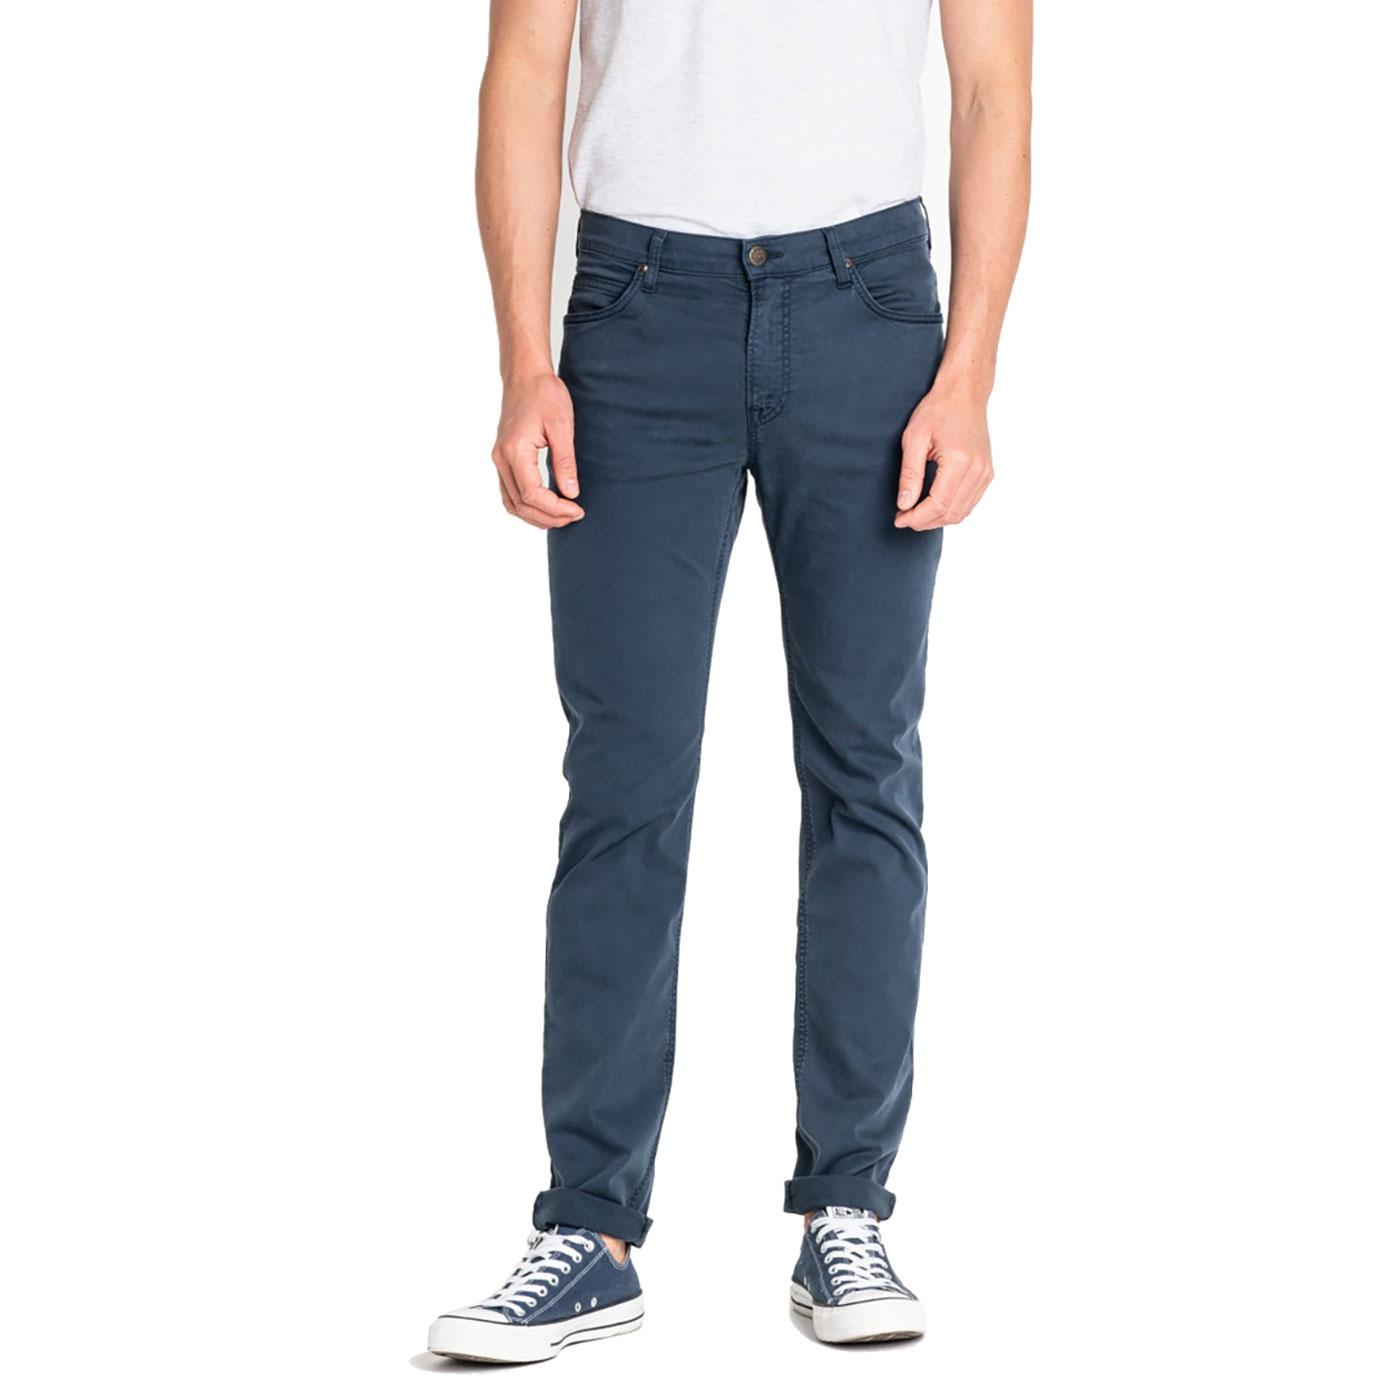 Rider LEE Men's Retro Slim Leg Chino Jeans - NAVY